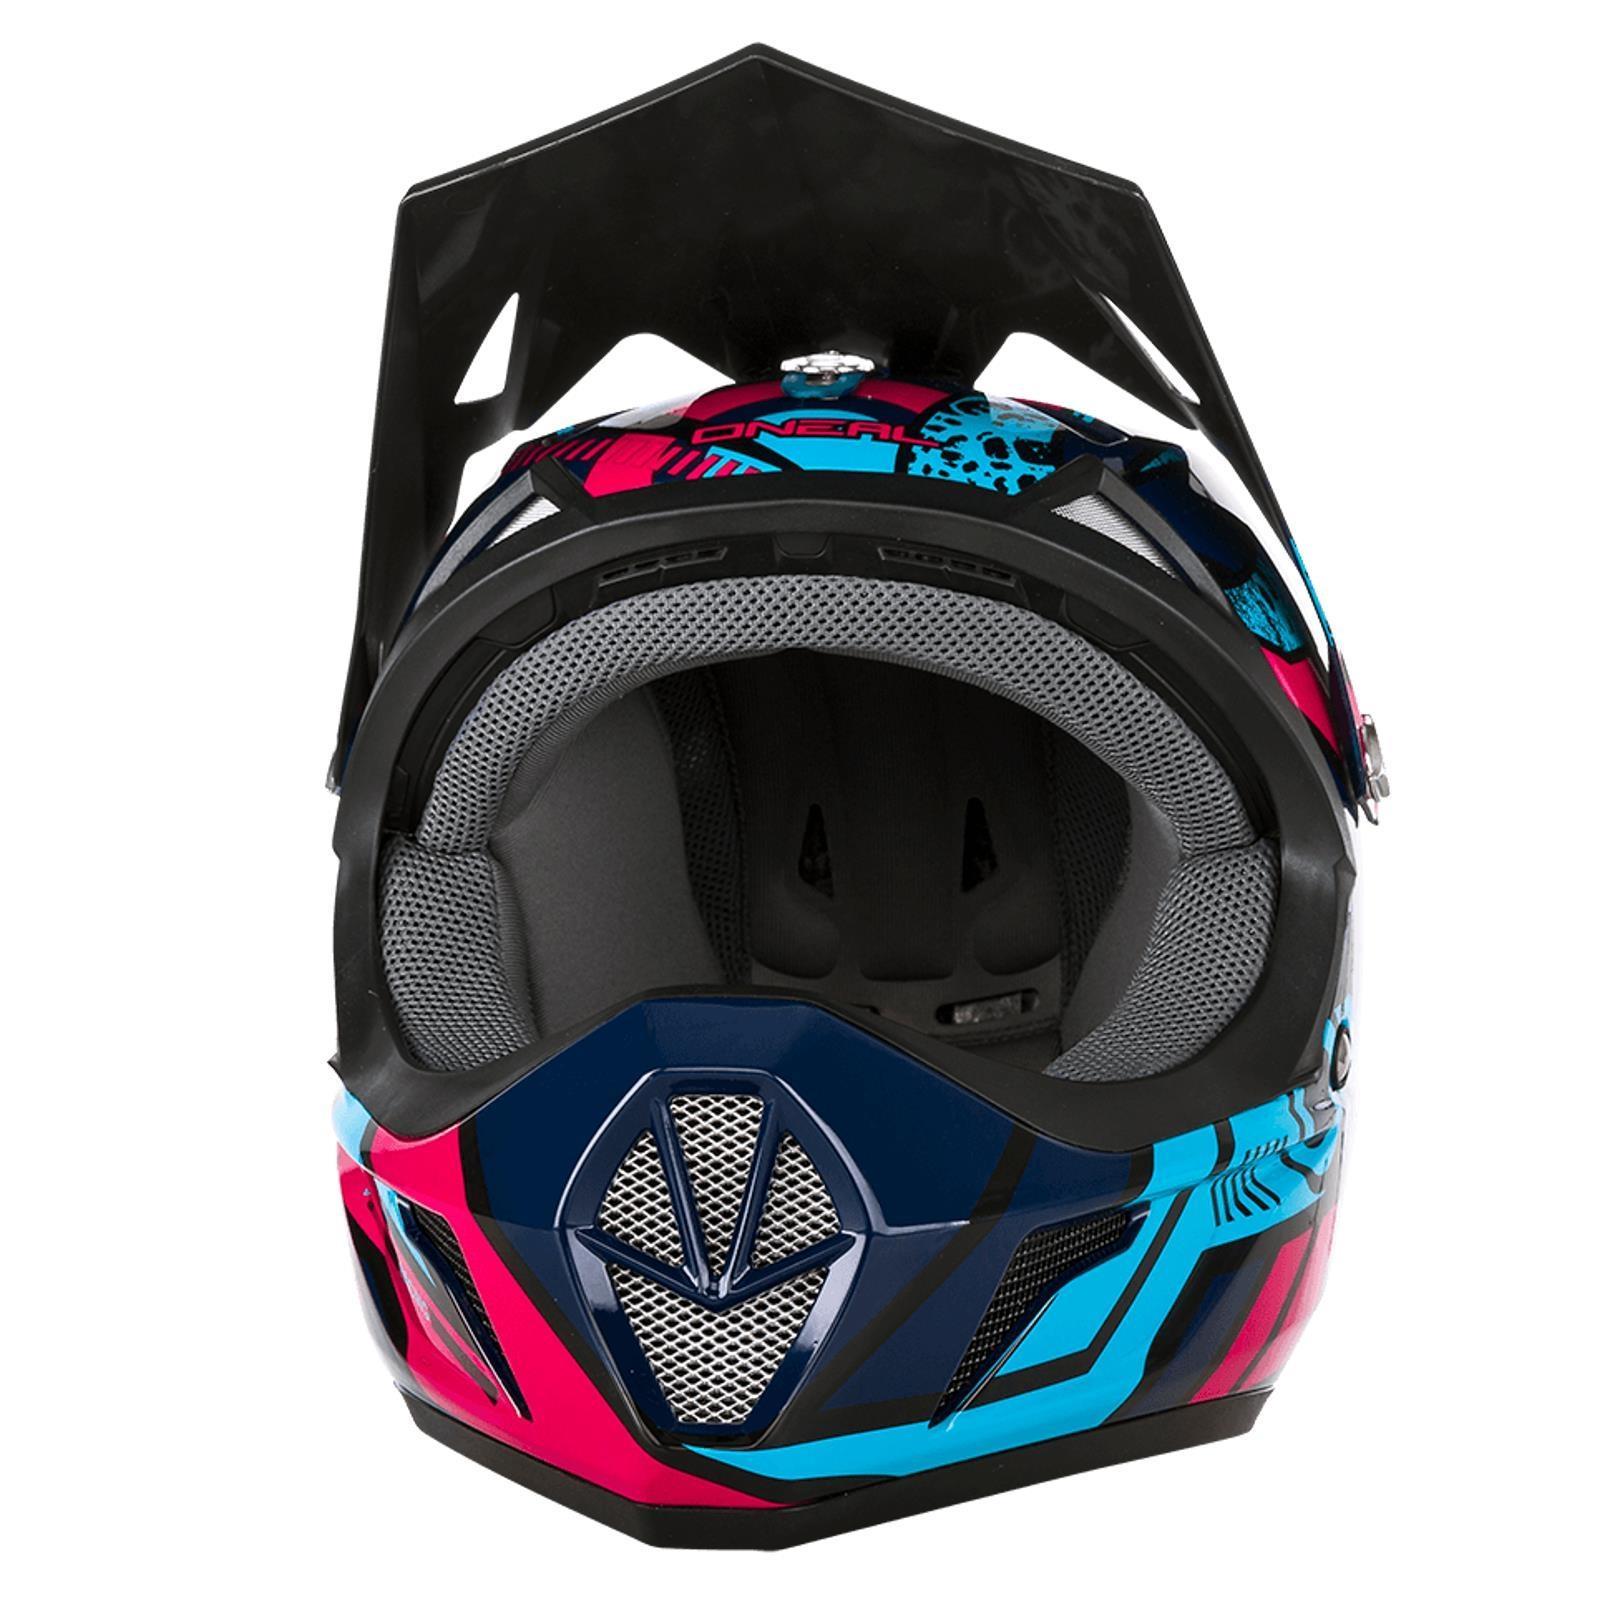 Indexbild 10 - ONeal-Sonus-Strike-Fahrrad-Helm-All-Mountain-Bike-MTB-Downhill-Fullface-Fidlock